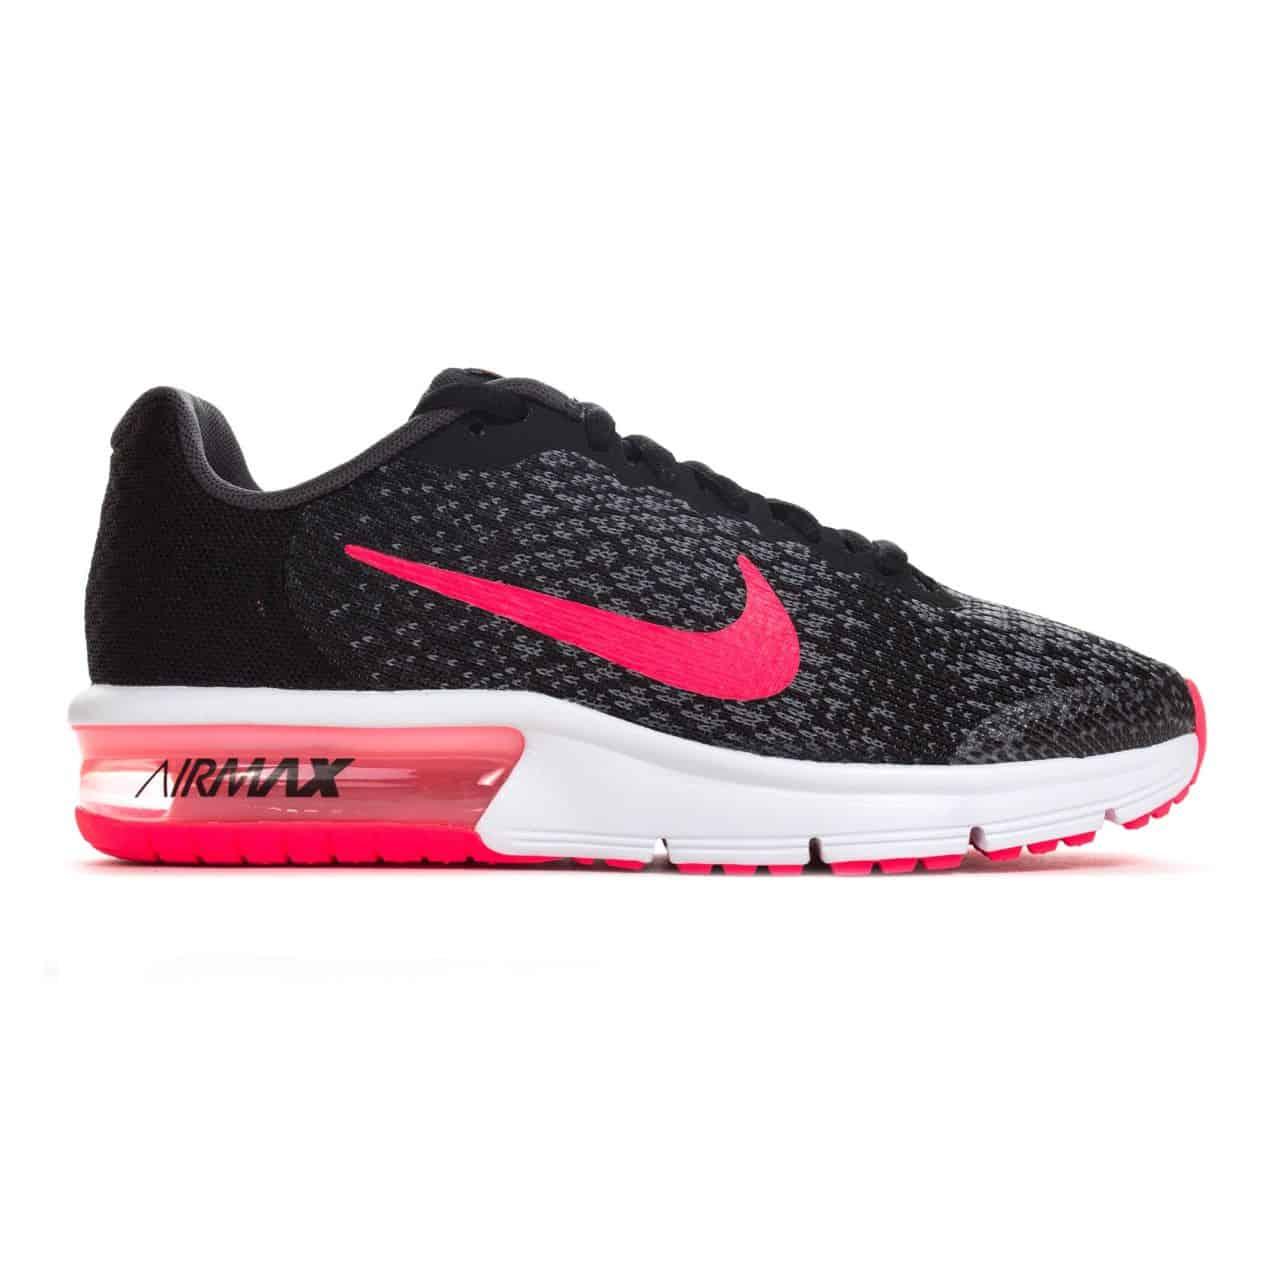 005 Adidasi Originali Nike Air Max Sequent